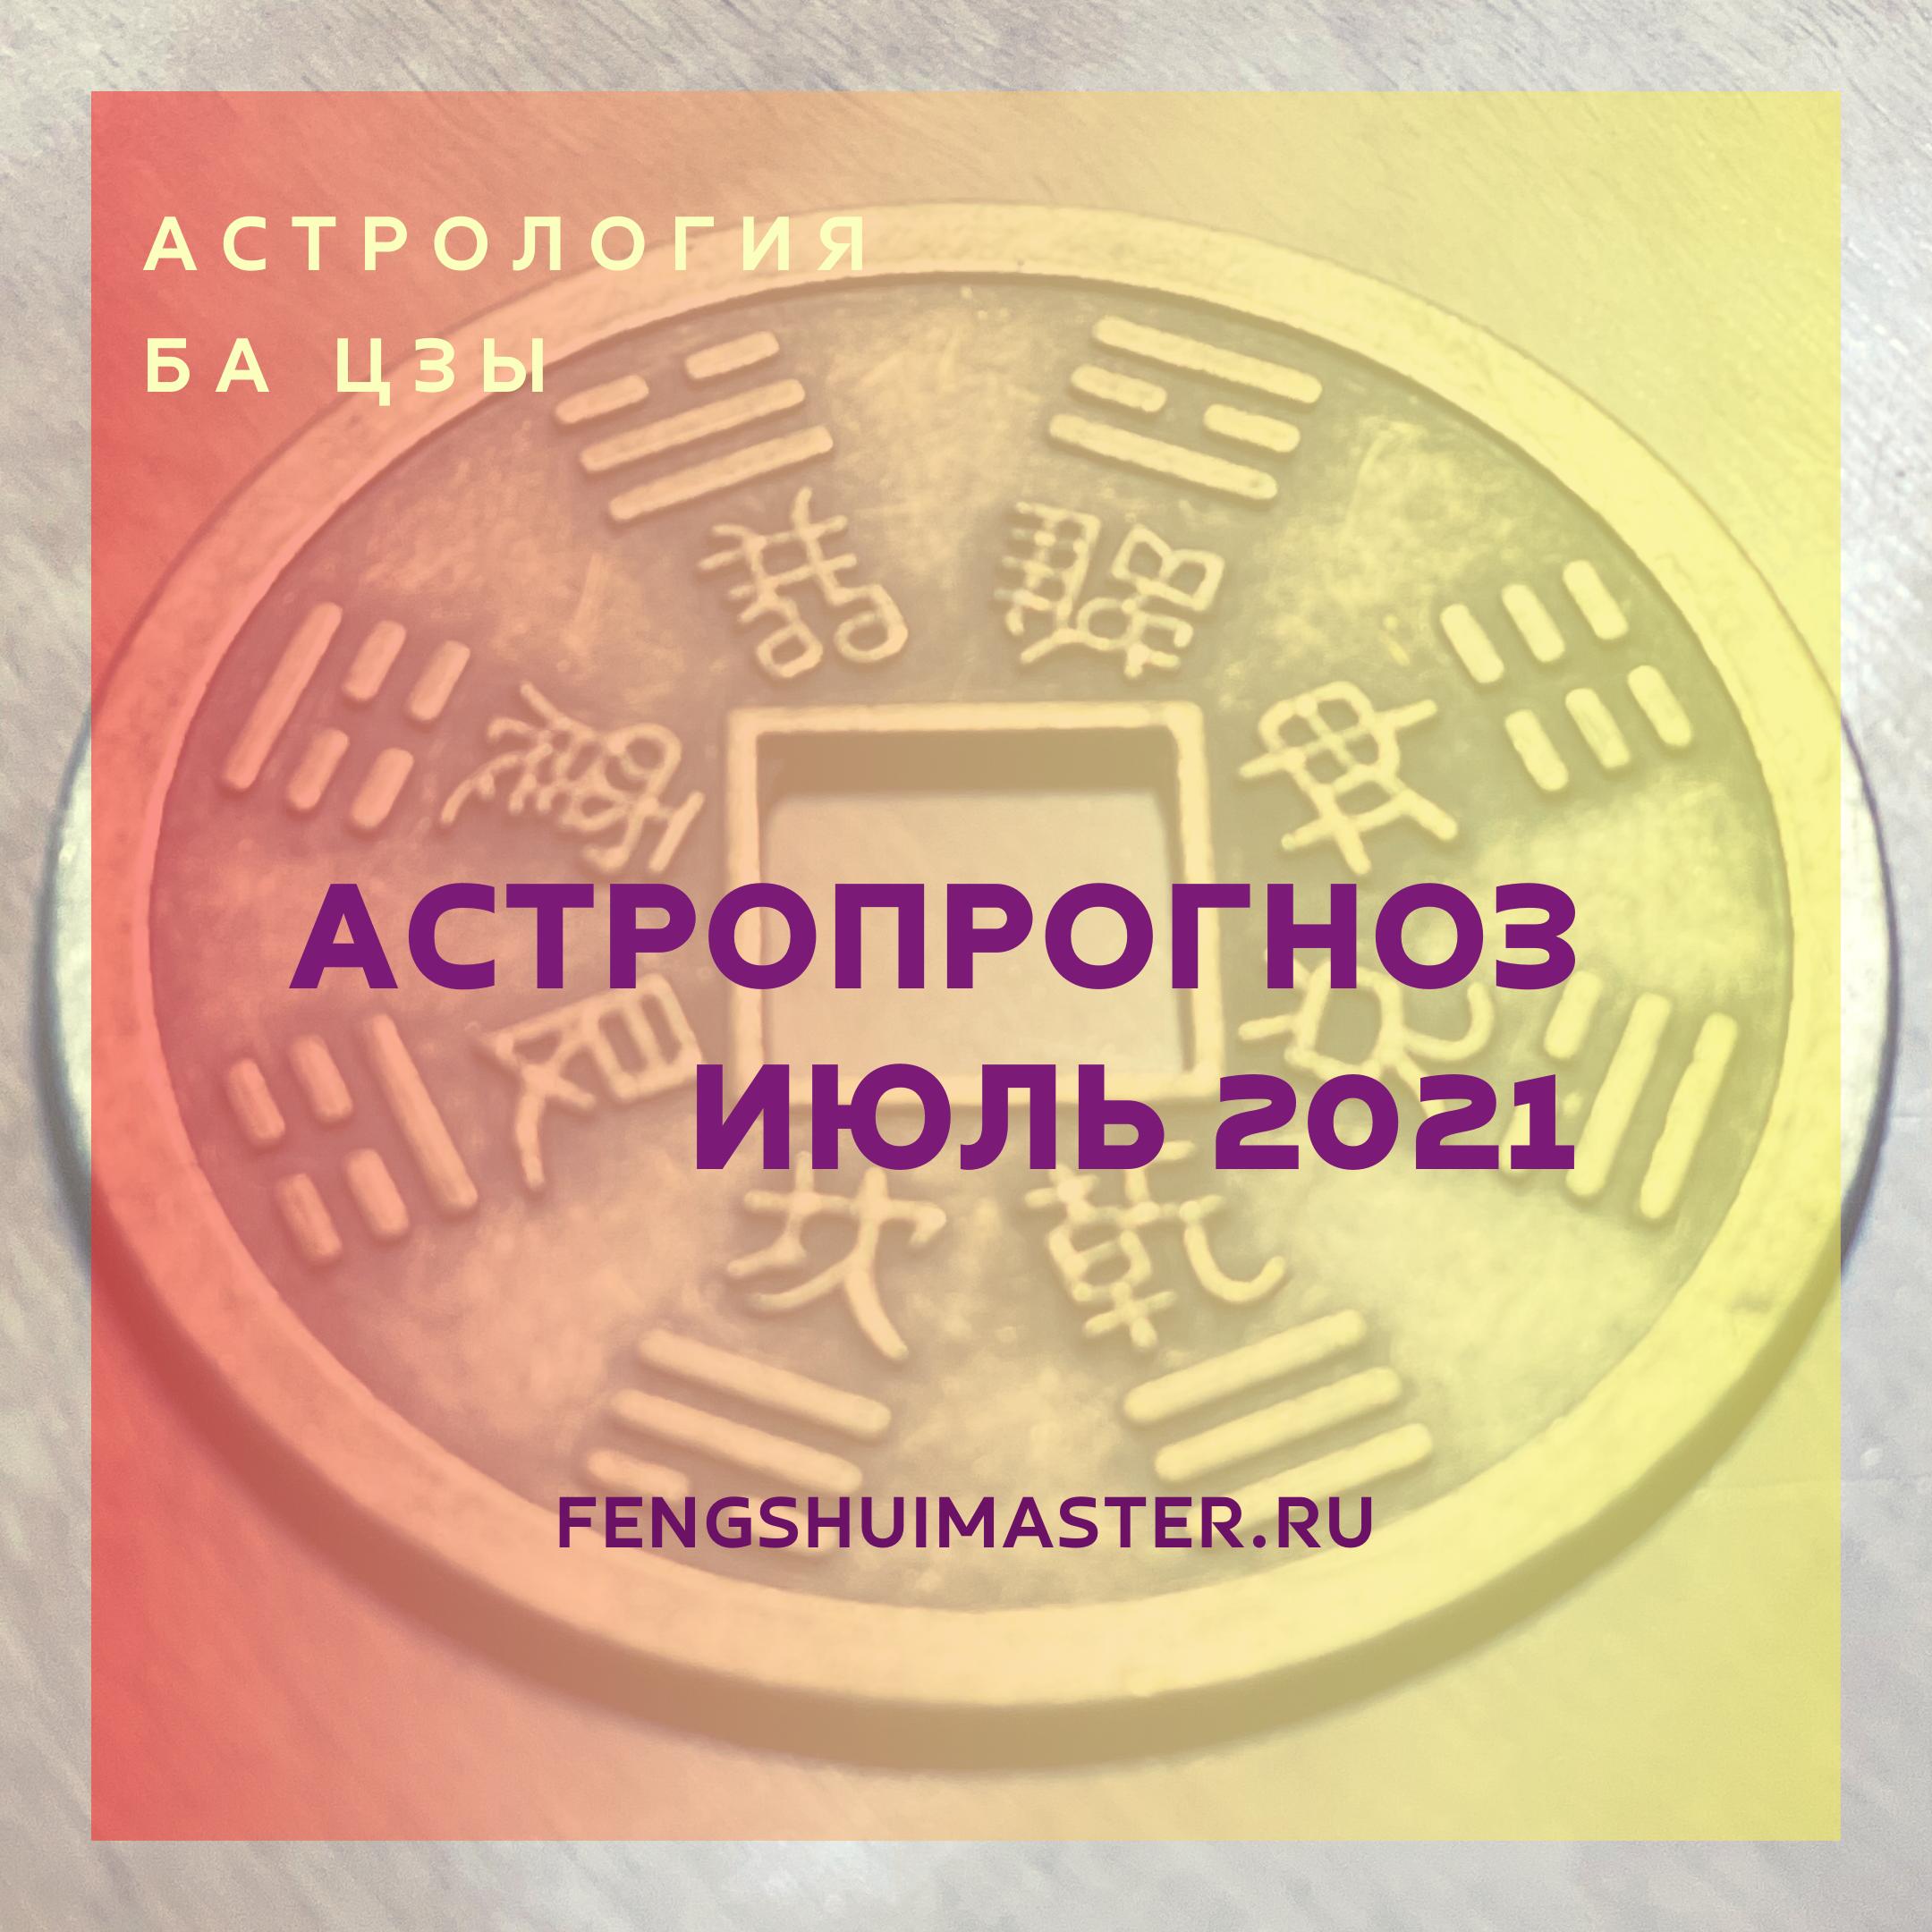 Астропрогноз-июль2021 - Fengshuimaster.Ru